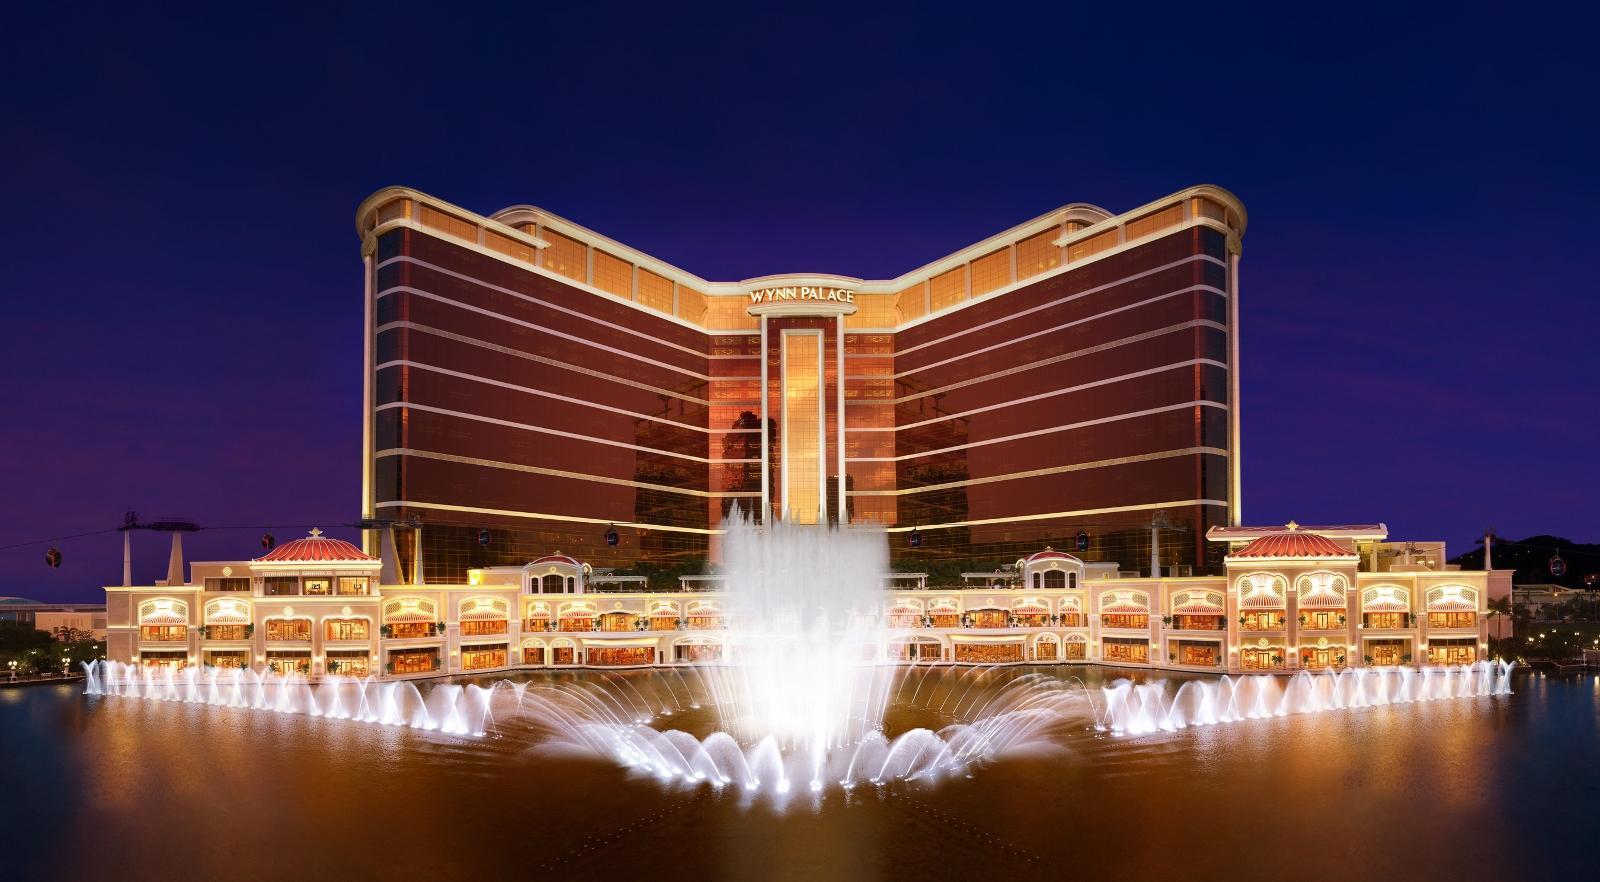 Inaugura el imponente Wynn Palace en Macao